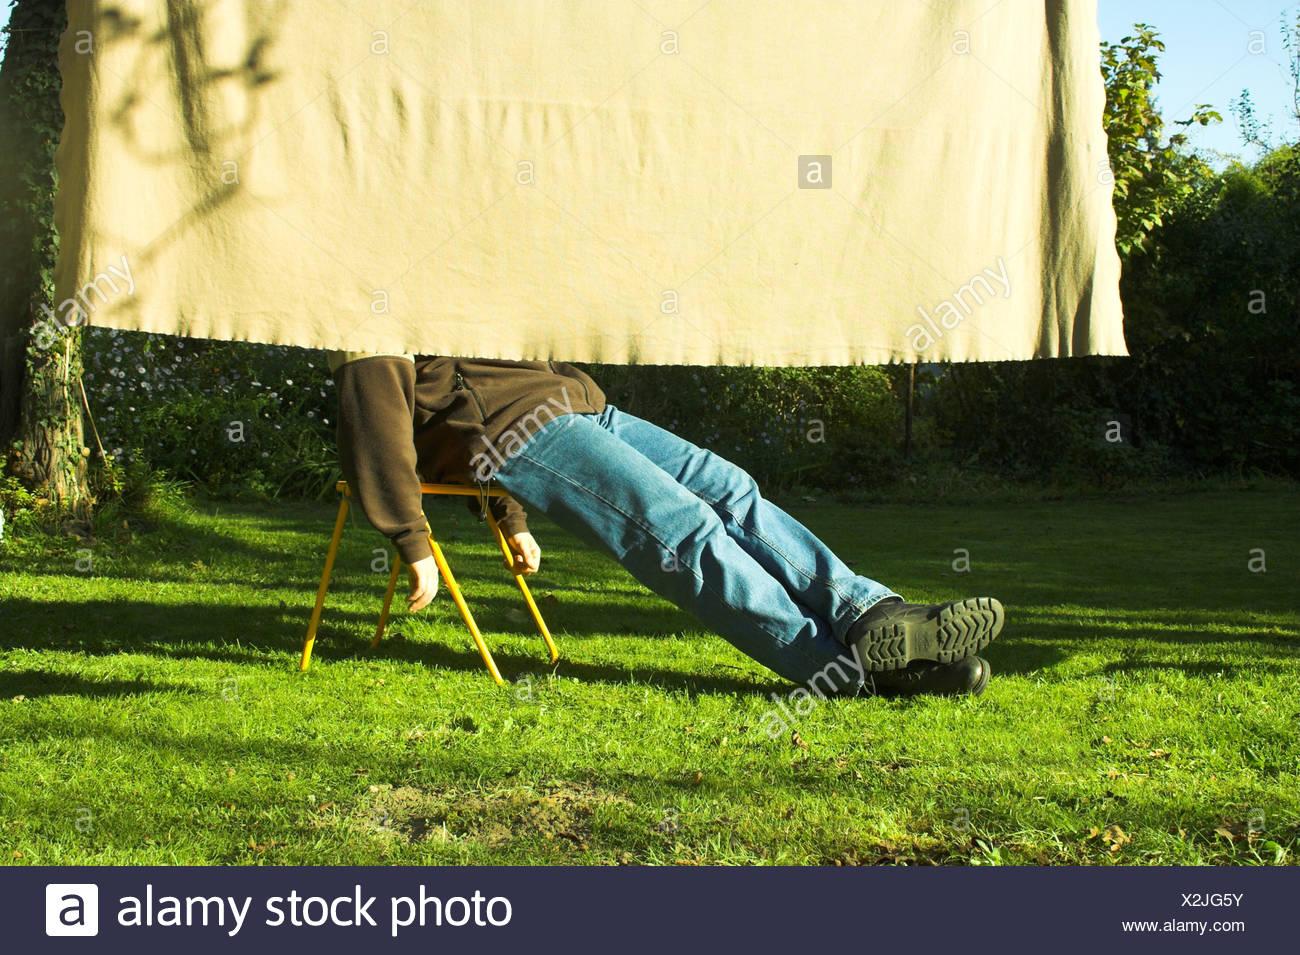 Hombre,disfrute,relajación,descansando,relajación,recreación Imagen De Stock